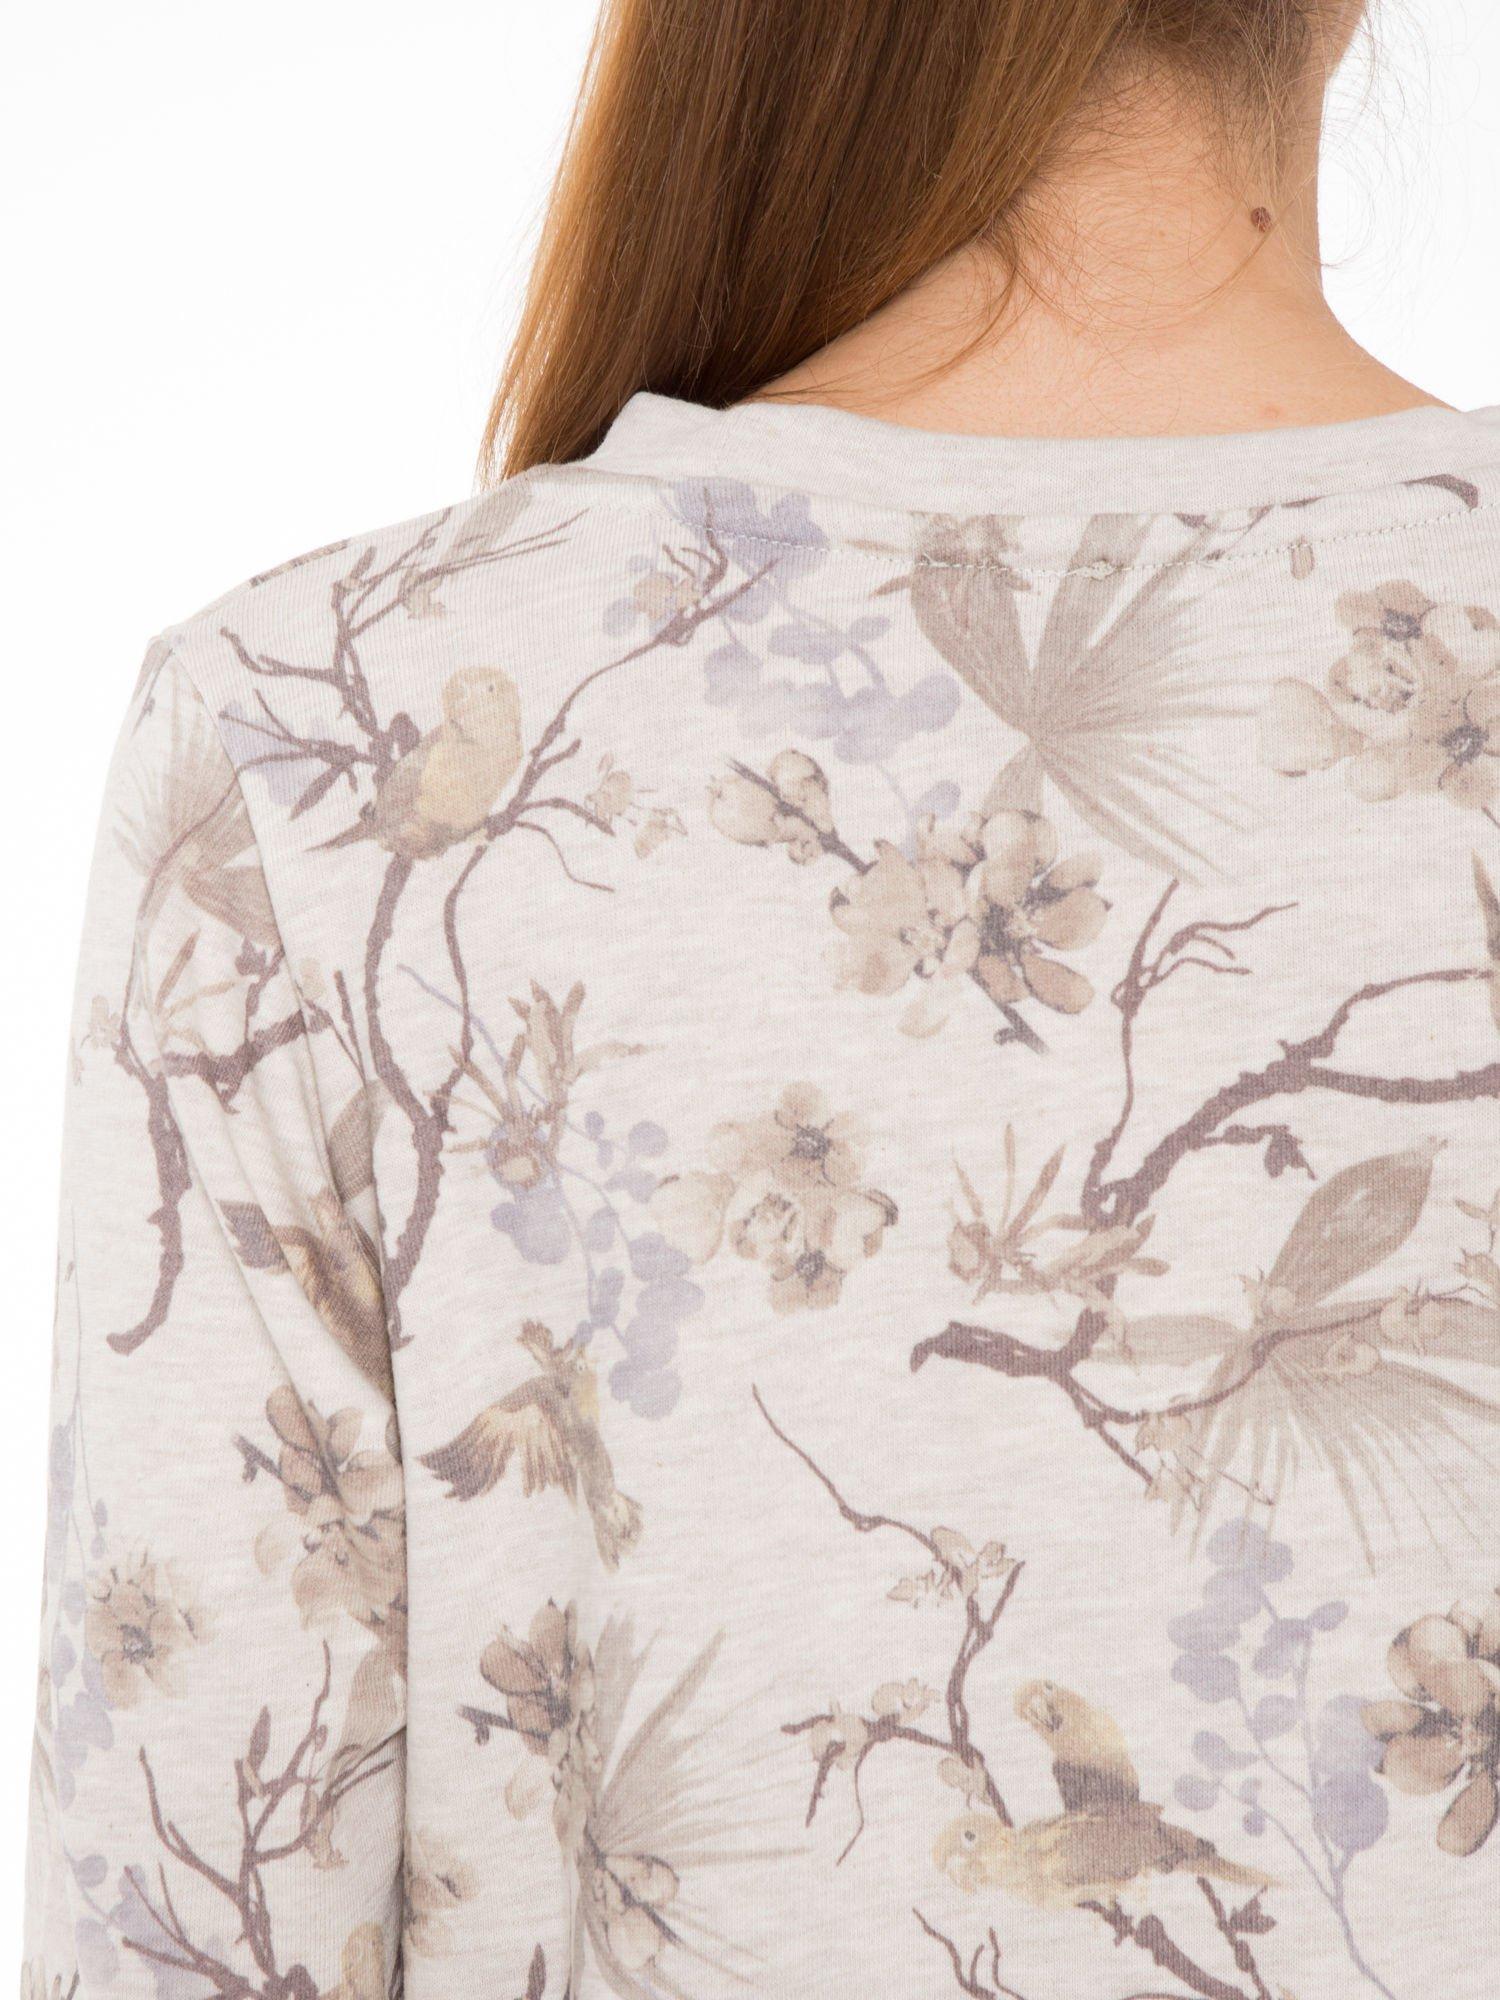 Beżowa bluza z nadrukiem all over floral print                                  zdj.                                  7